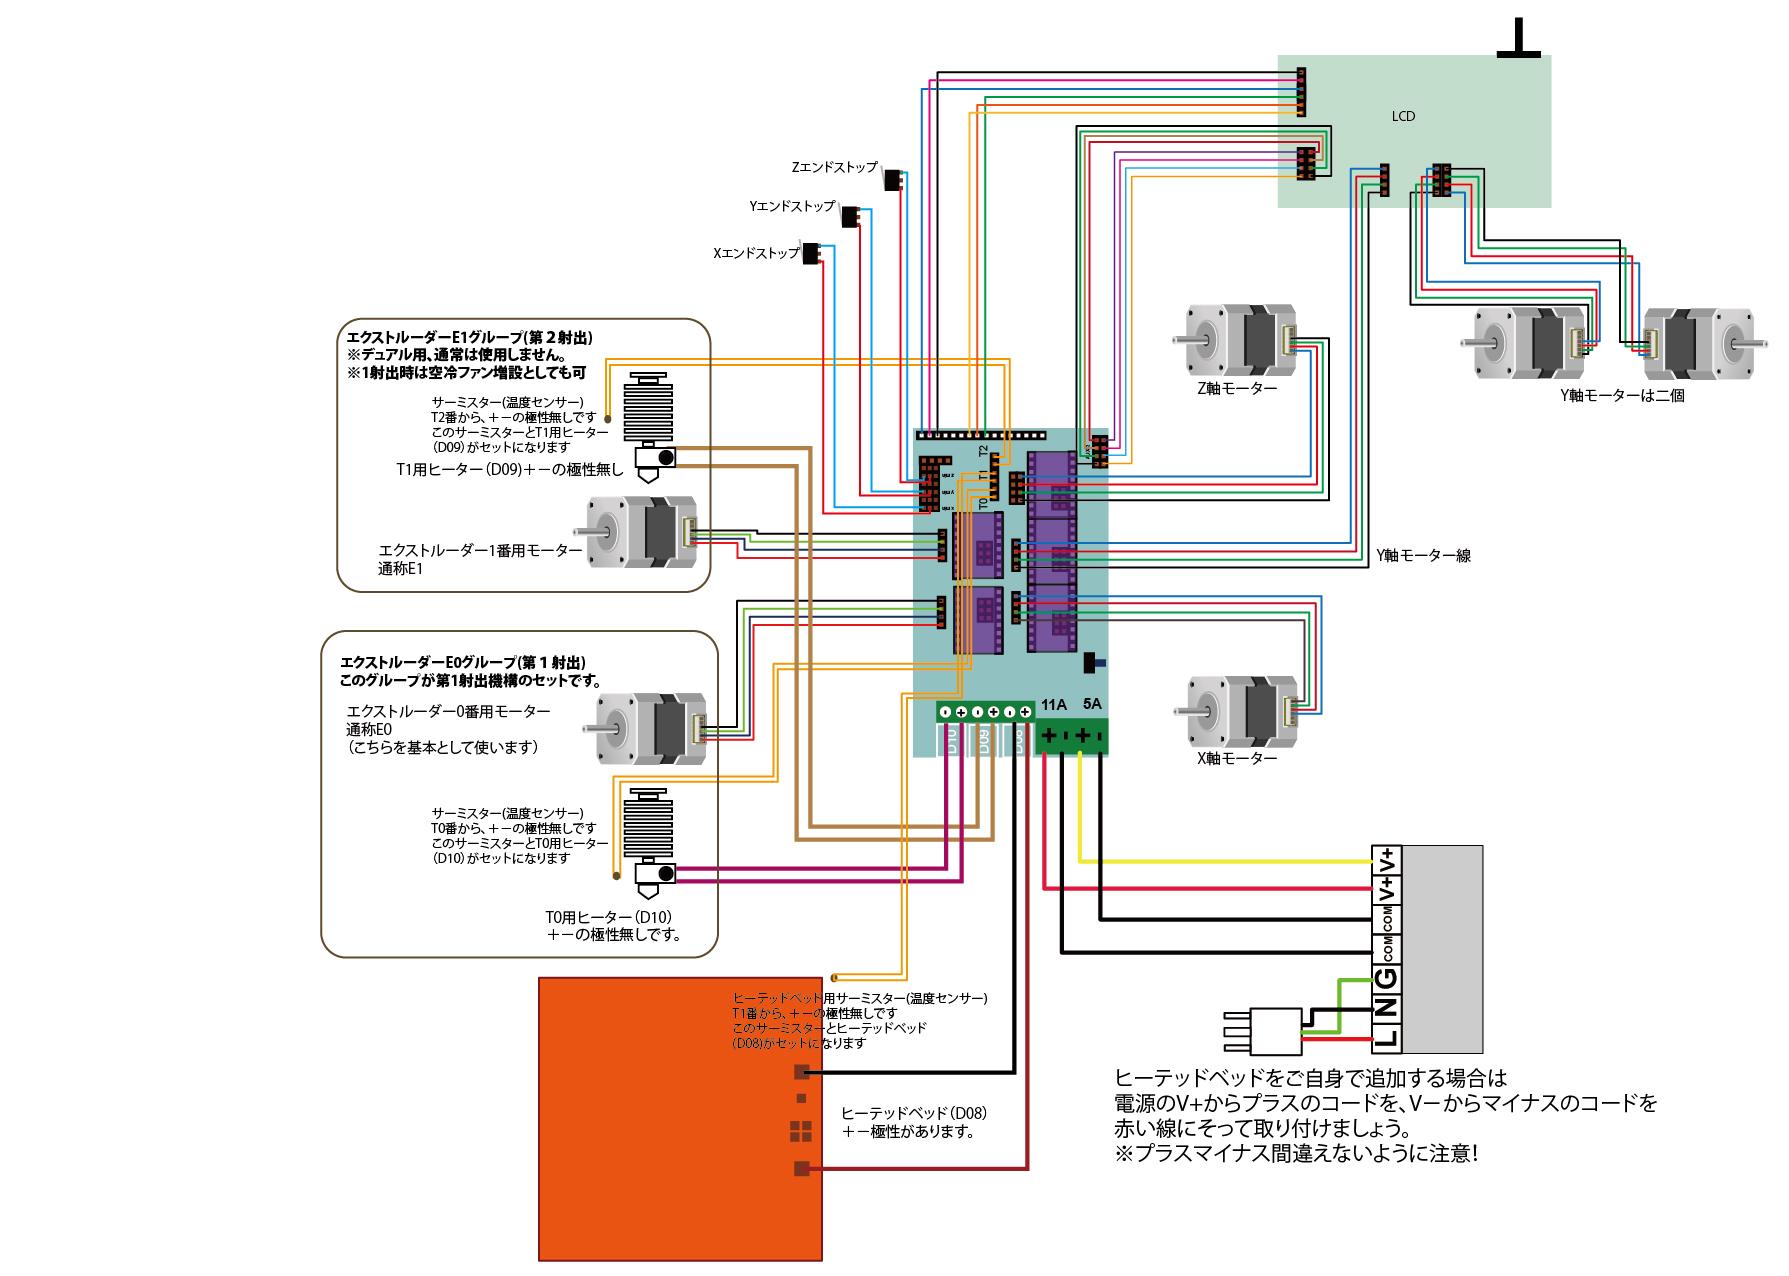 http://wiki.genkei.jp/image/genkei/Lepton/HBPwiring.jpg